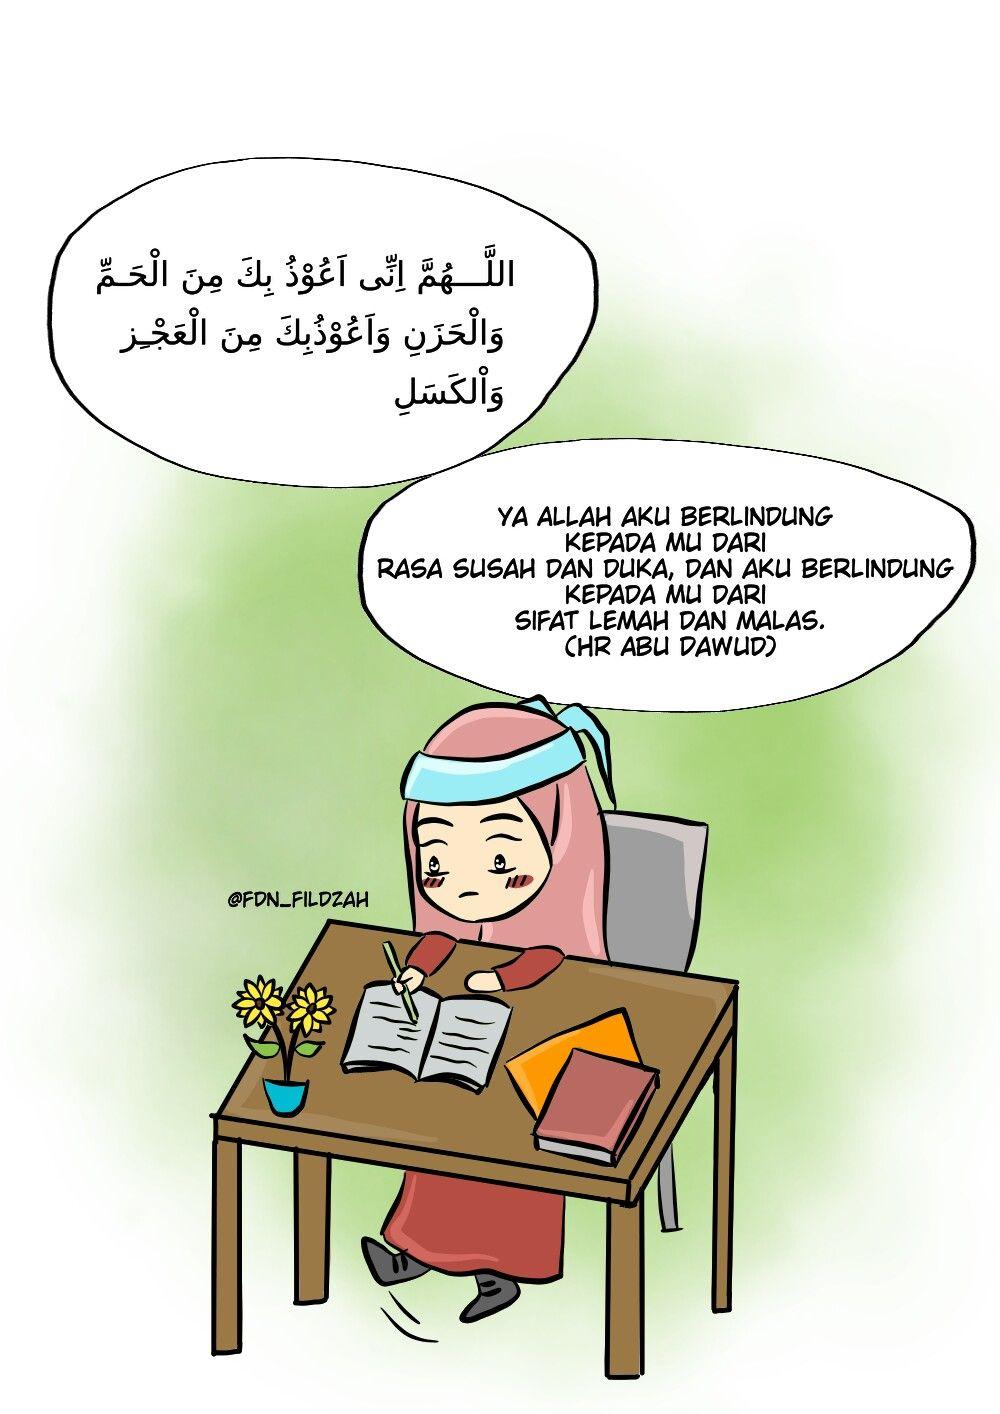 Kerja Keras Muslimah Tangguh Dengan Gambar Kartun Motivasi Kerja Keras